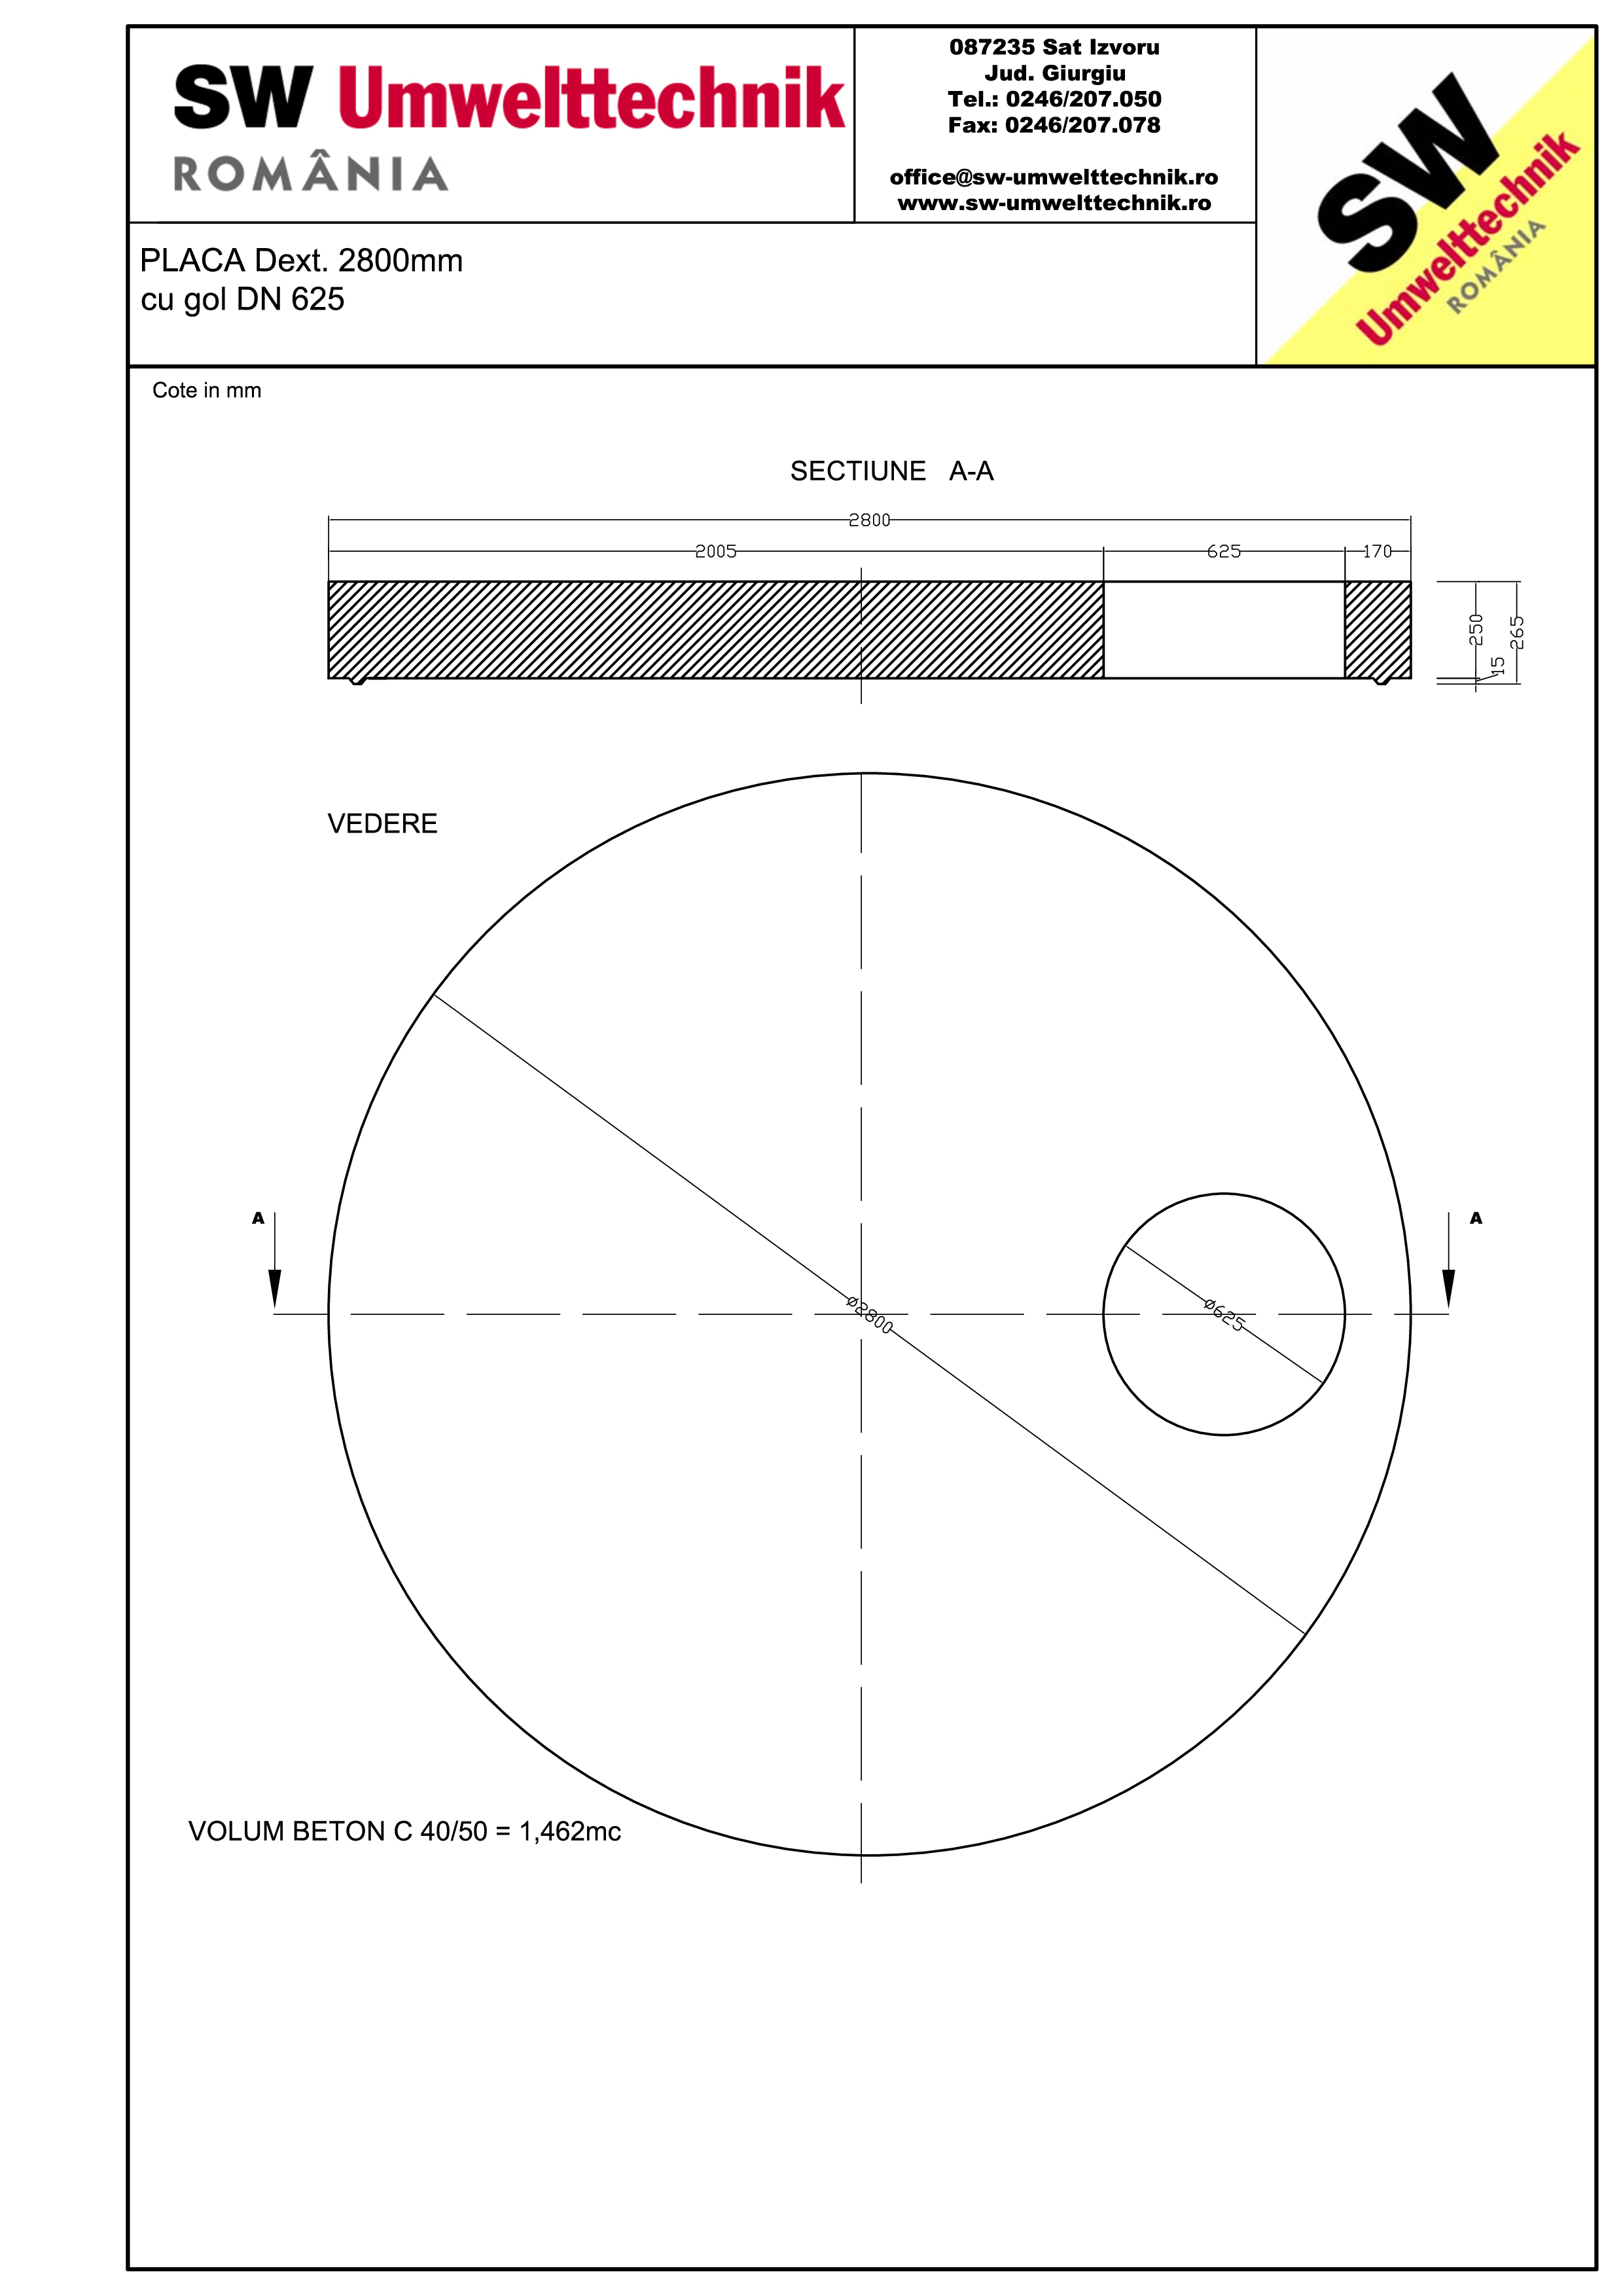 Pagina 1 - CAD-PDF Placa Dext. 2800 H250 cu gol DN625 SW UMWELTTECHNIK Detaliu de produs